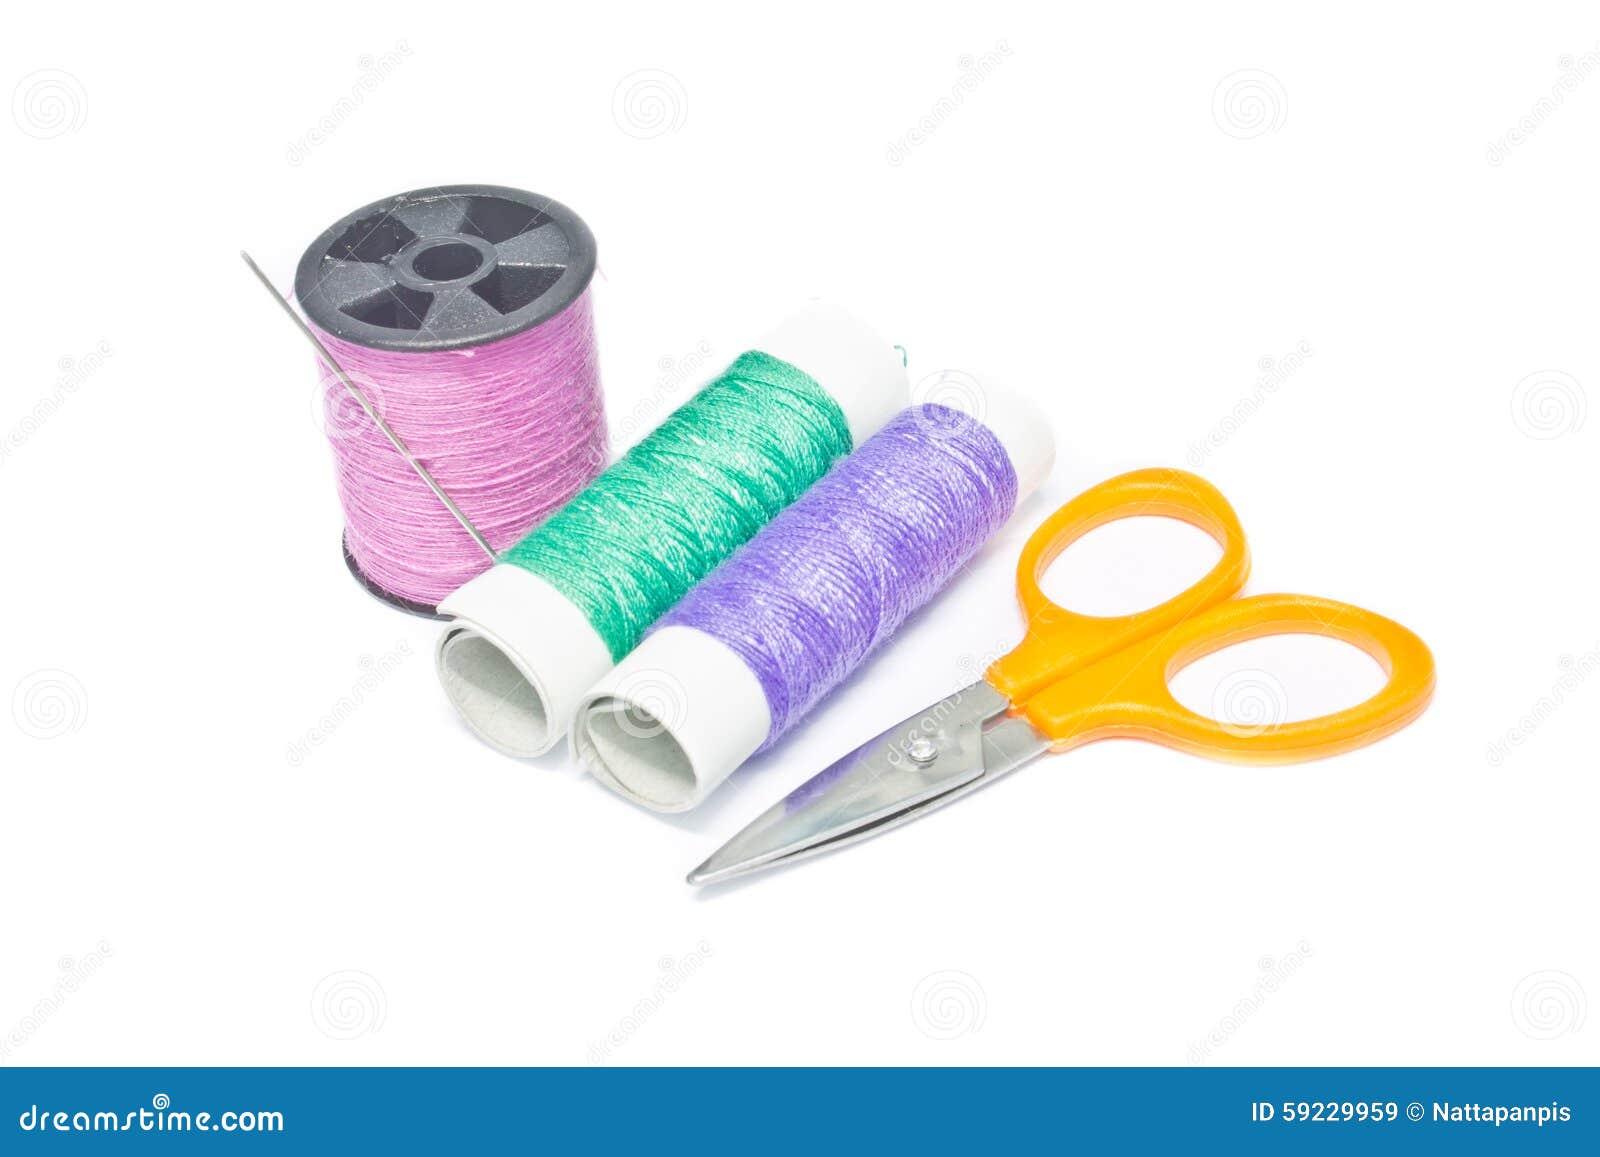 Download Hilo de coser imagen de archivo. Imagen de cosa, bobina - 59229959